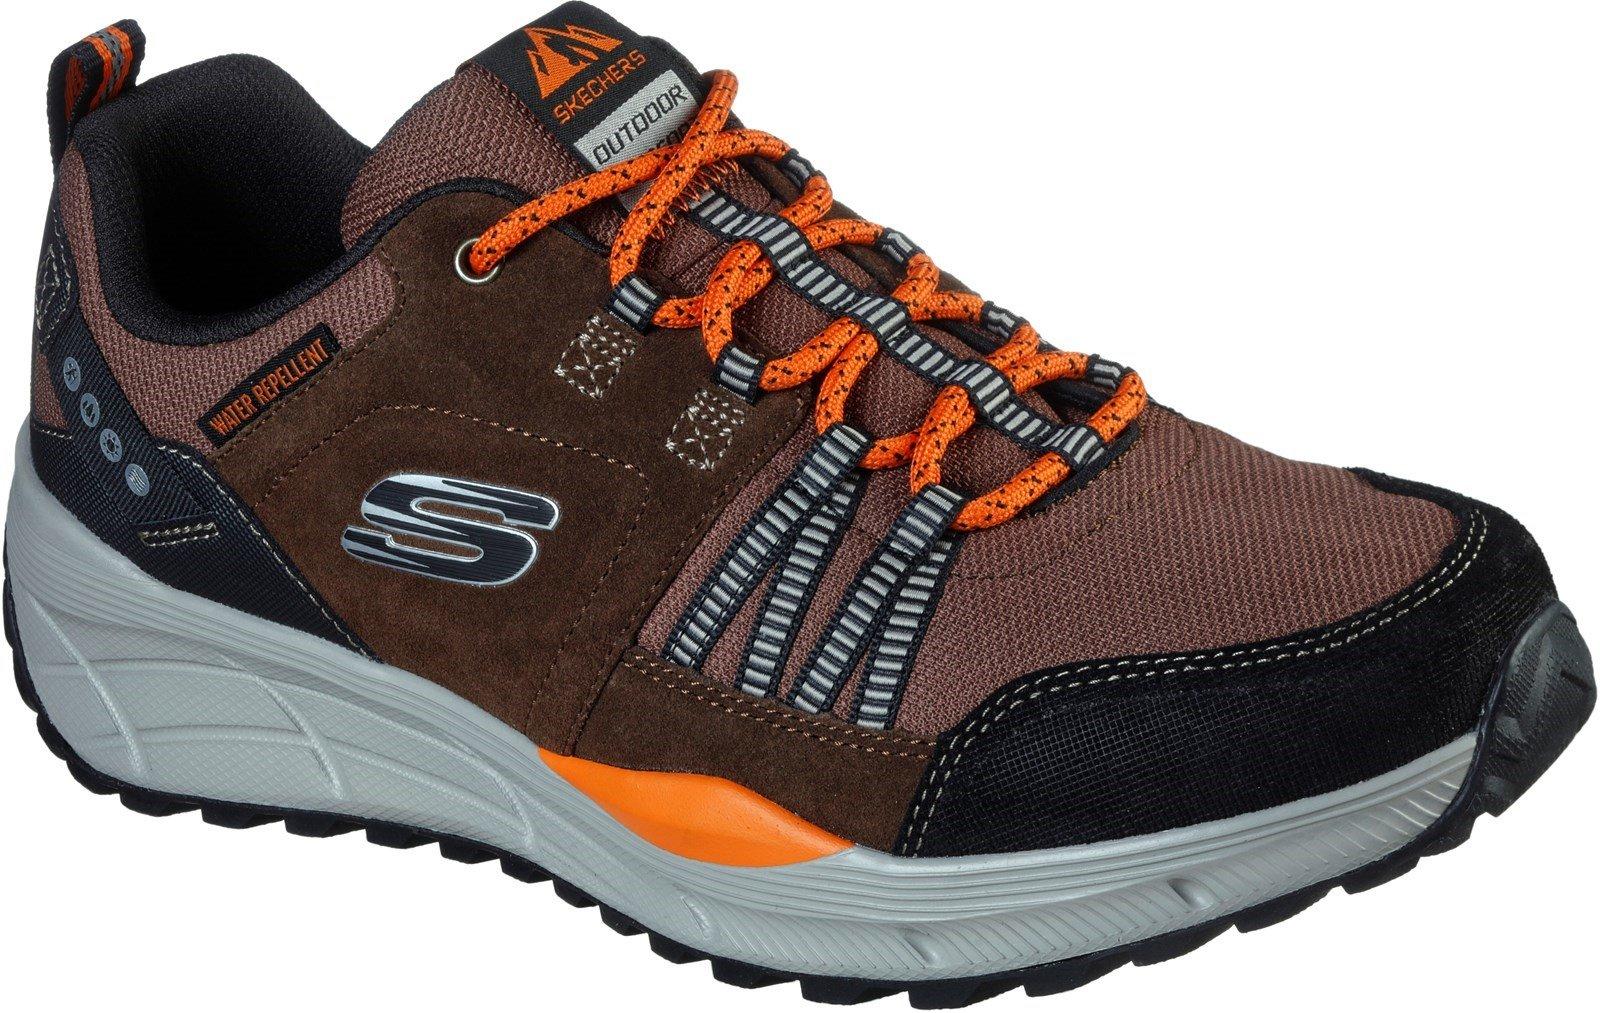 Skechers Men's Equalizer 4.0 Trail Sports Trainer Various Colours 31113 - Brown/Black 12